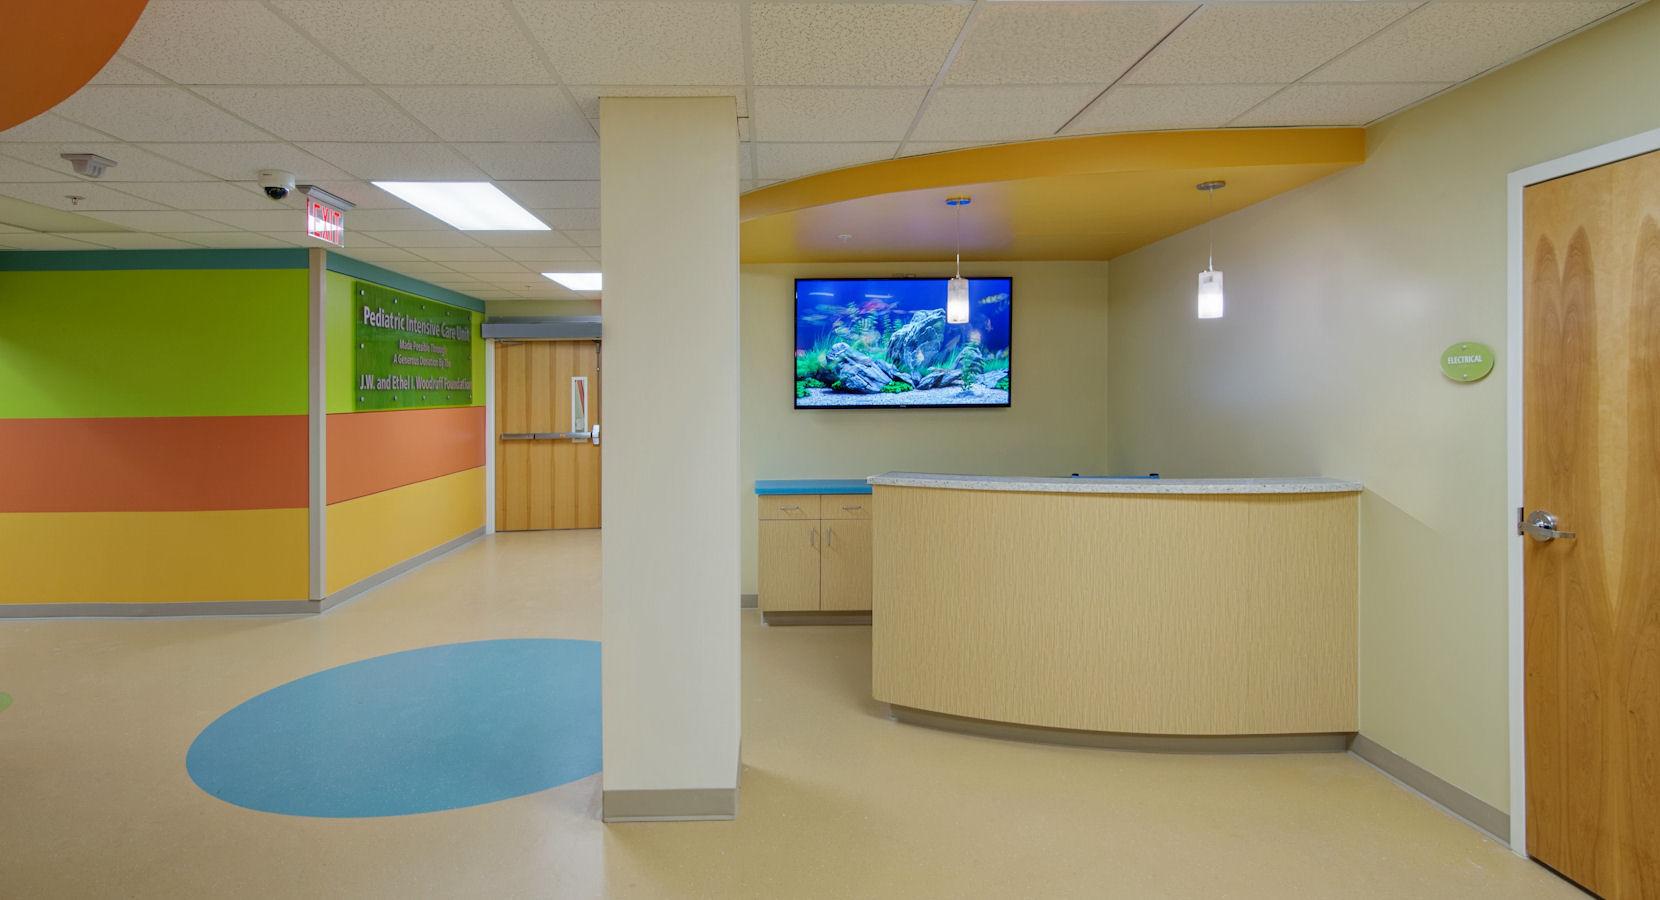 healthcare-slider-02-1660x900